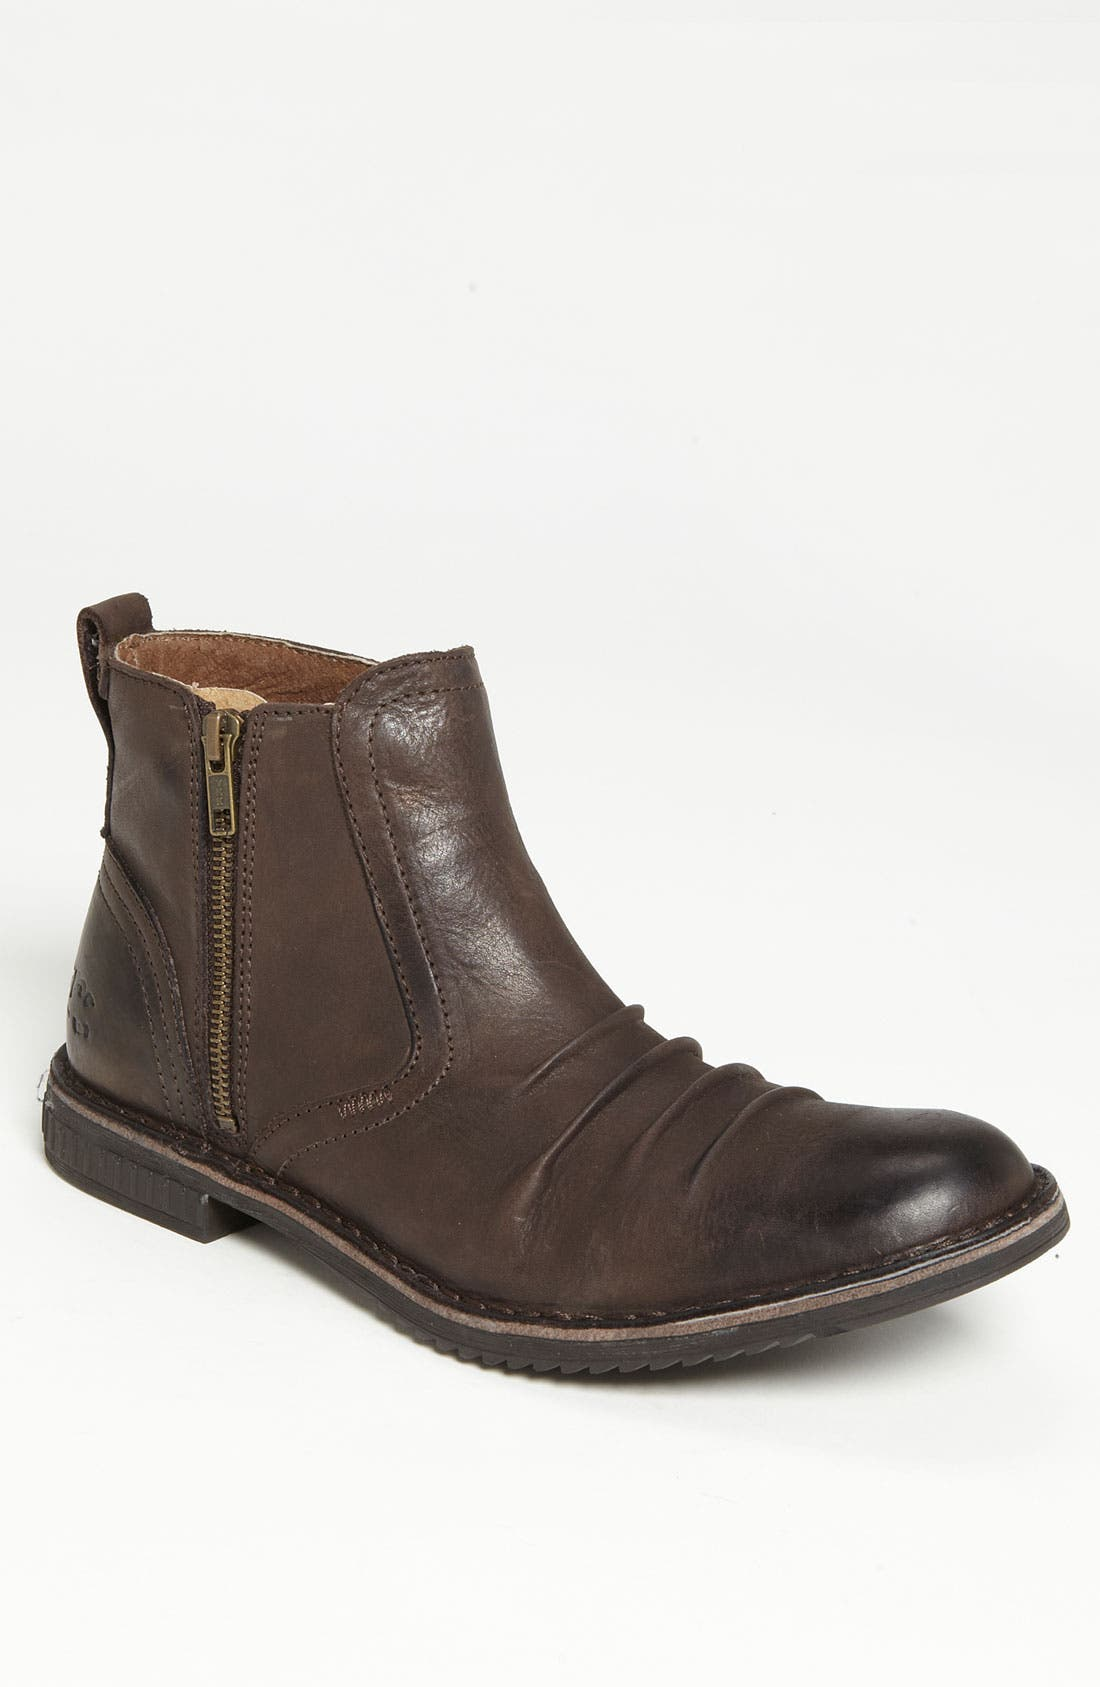 Main Image - Kickers 'Jesoif' Boot